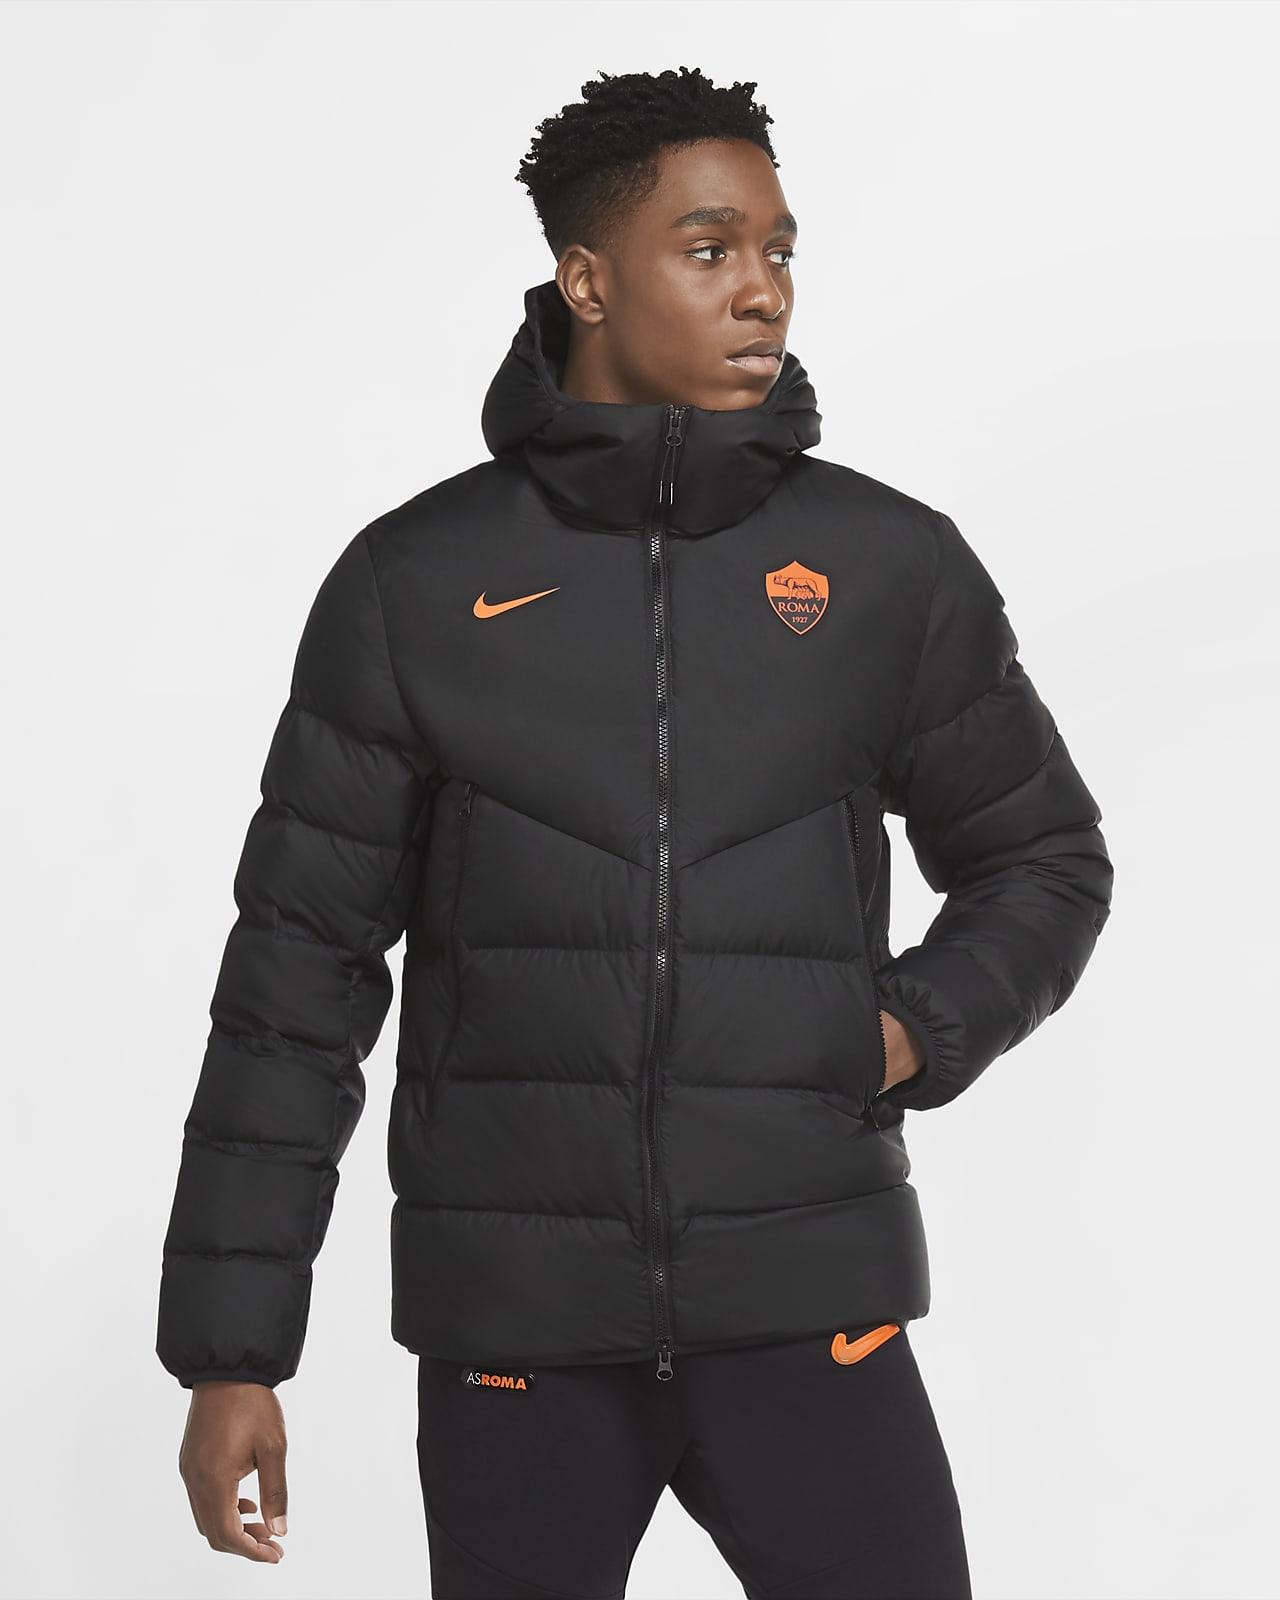 apetito Dibuja una imagen esquema  AS Roma Strike Chaqueta de fútbol - Hombre. Nike ES